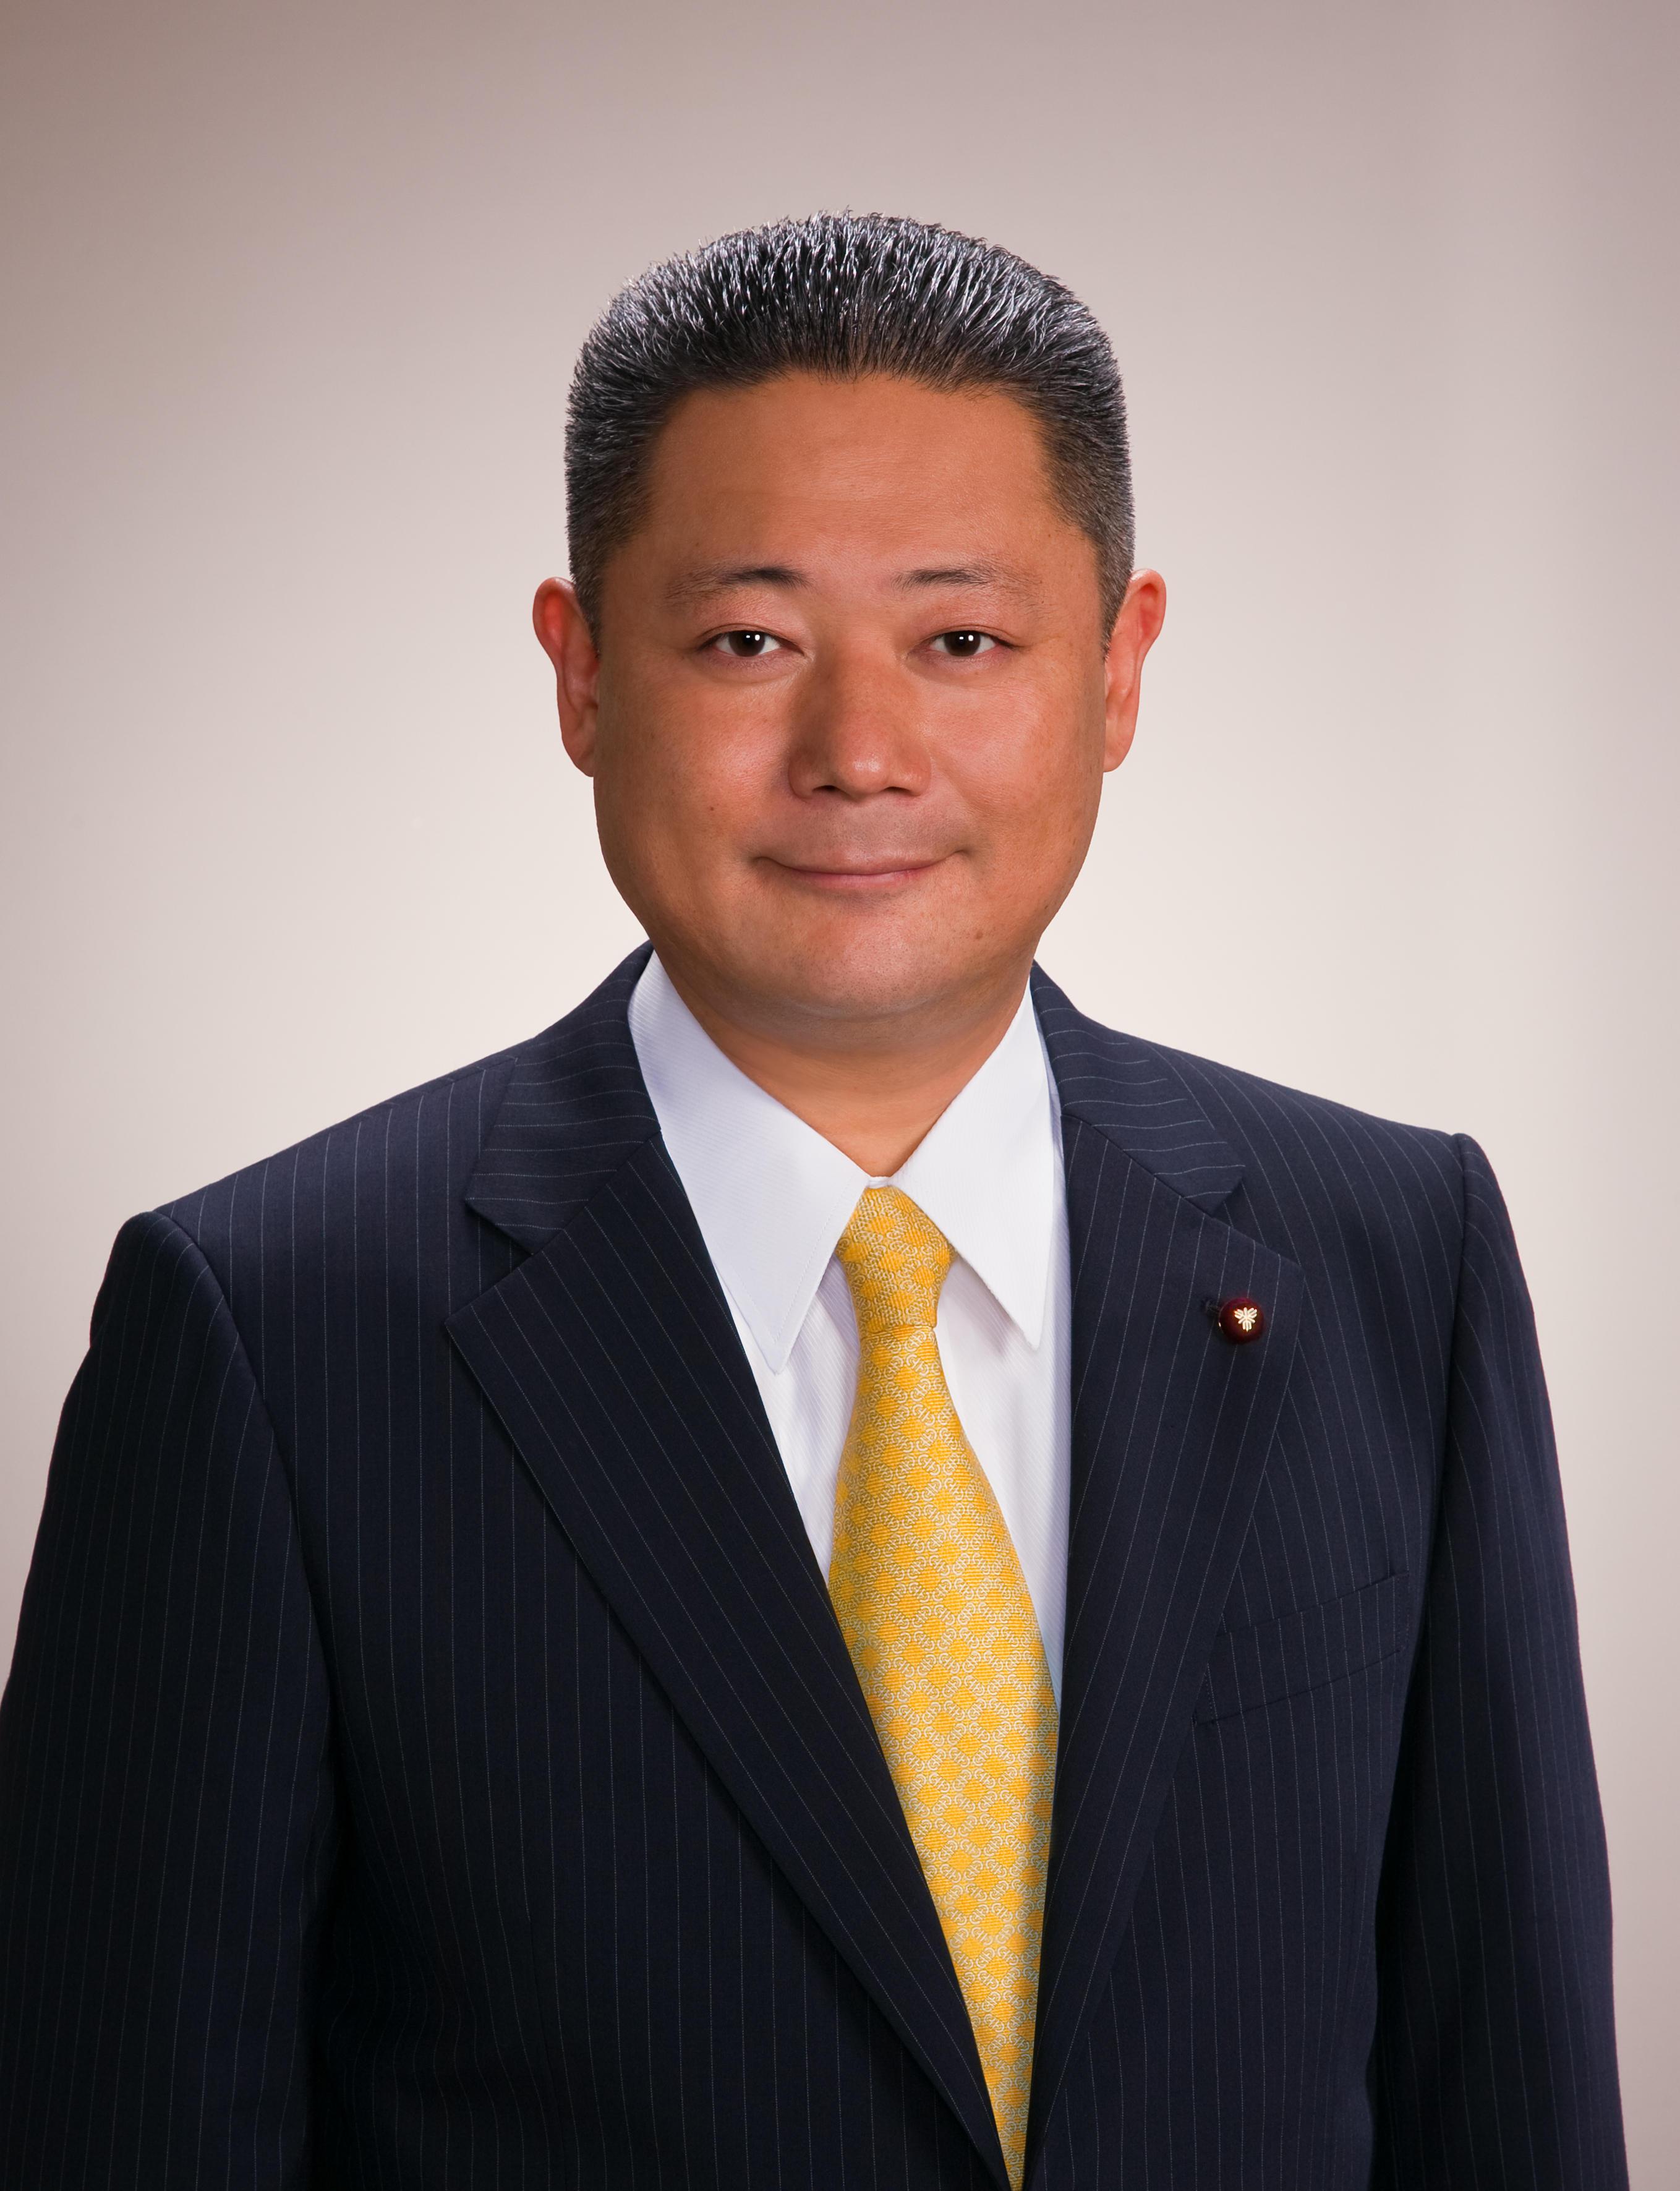 BS-TBS「報道1930」 馬場伸幸幹事長 生出演のお知らせ